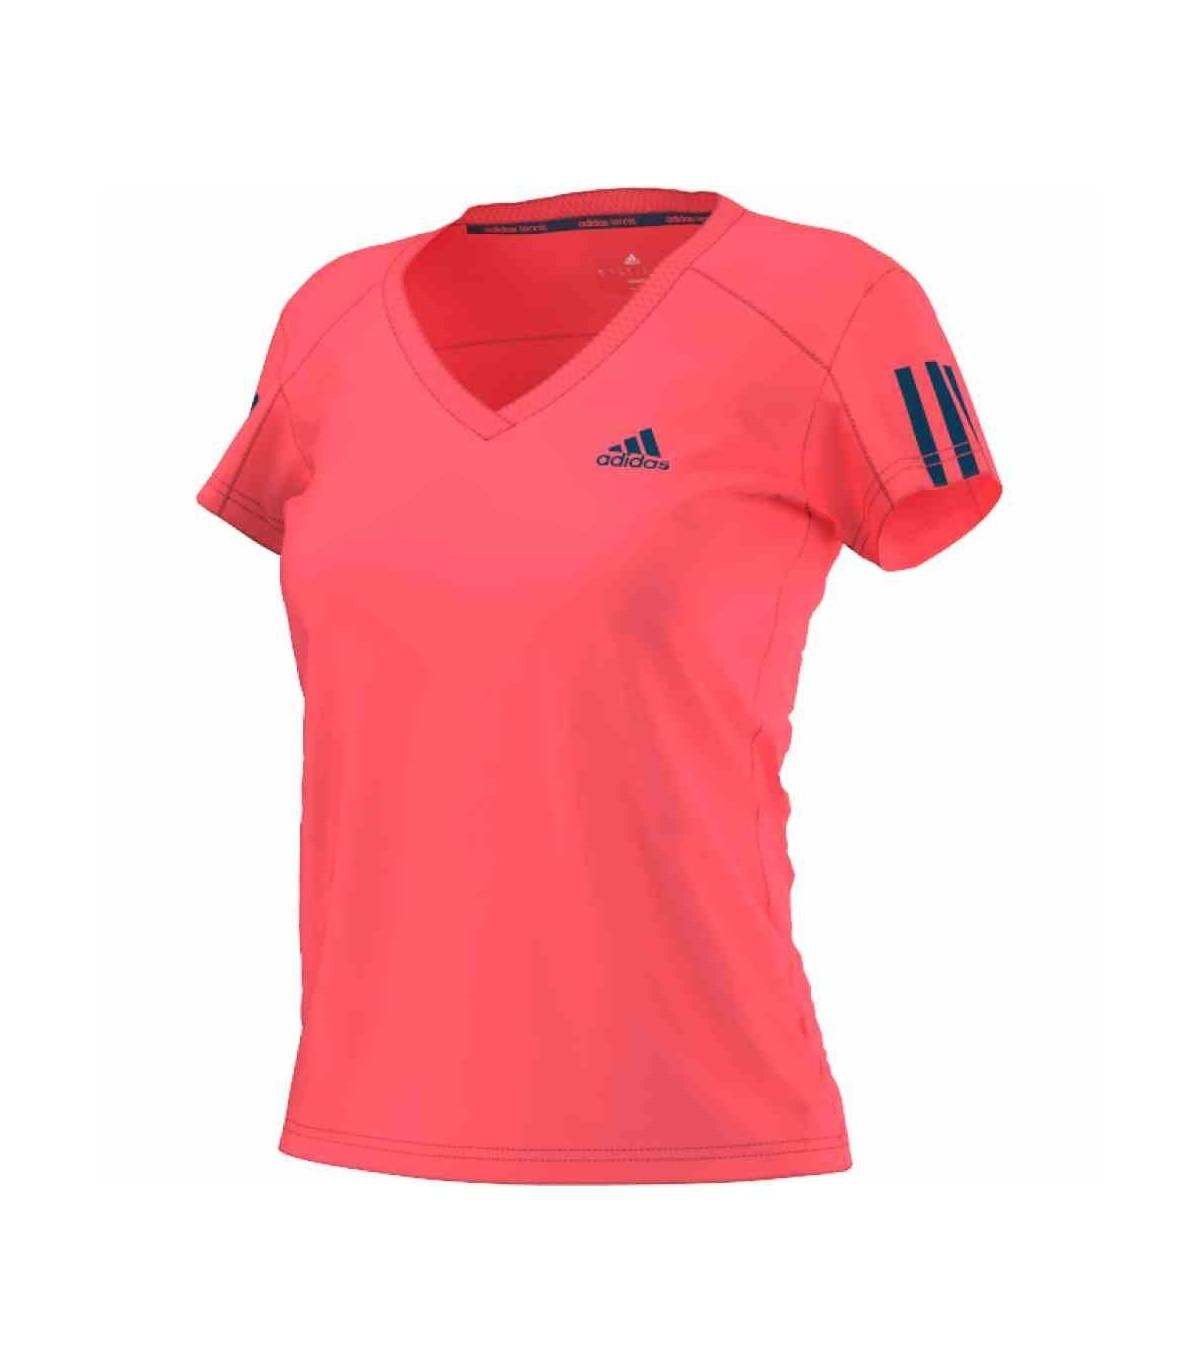 S15 My Adidas Red Club Tech T flash Shirt F16 Women Squash Steel HBqWHC